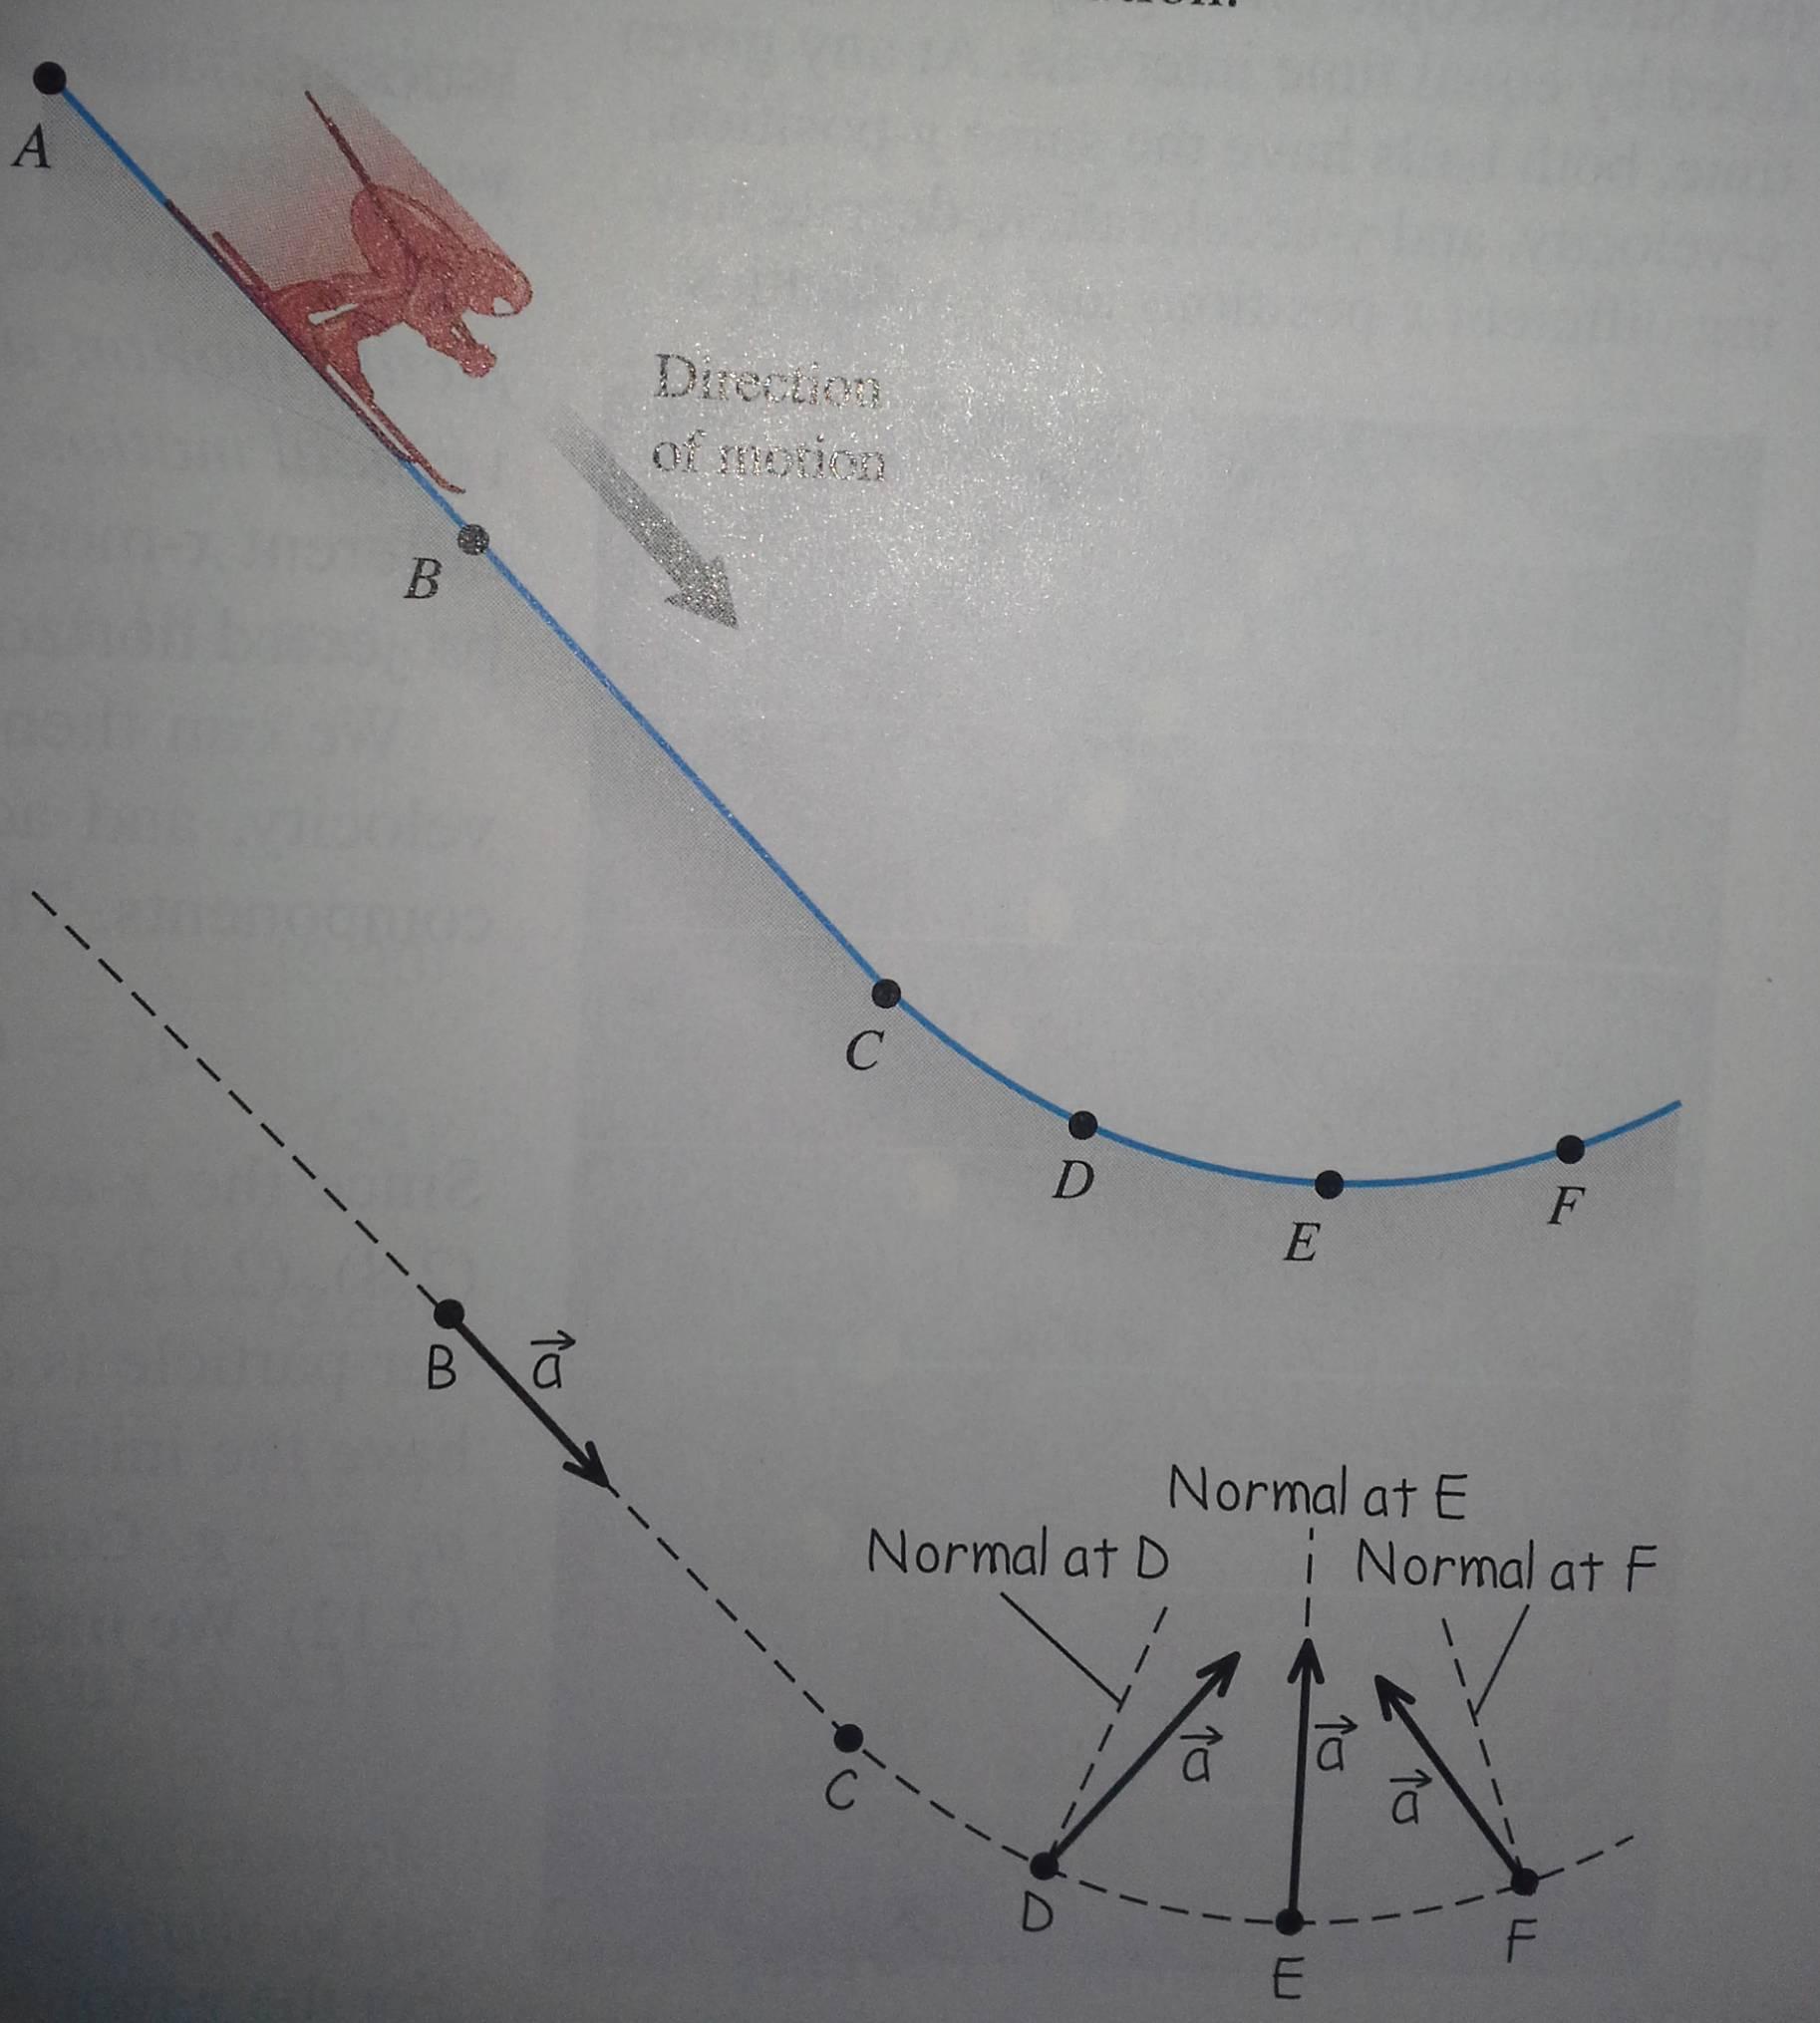 slope orientation diagram suburban rv furnace wiring newtonian mechanics animating an acceleration vector